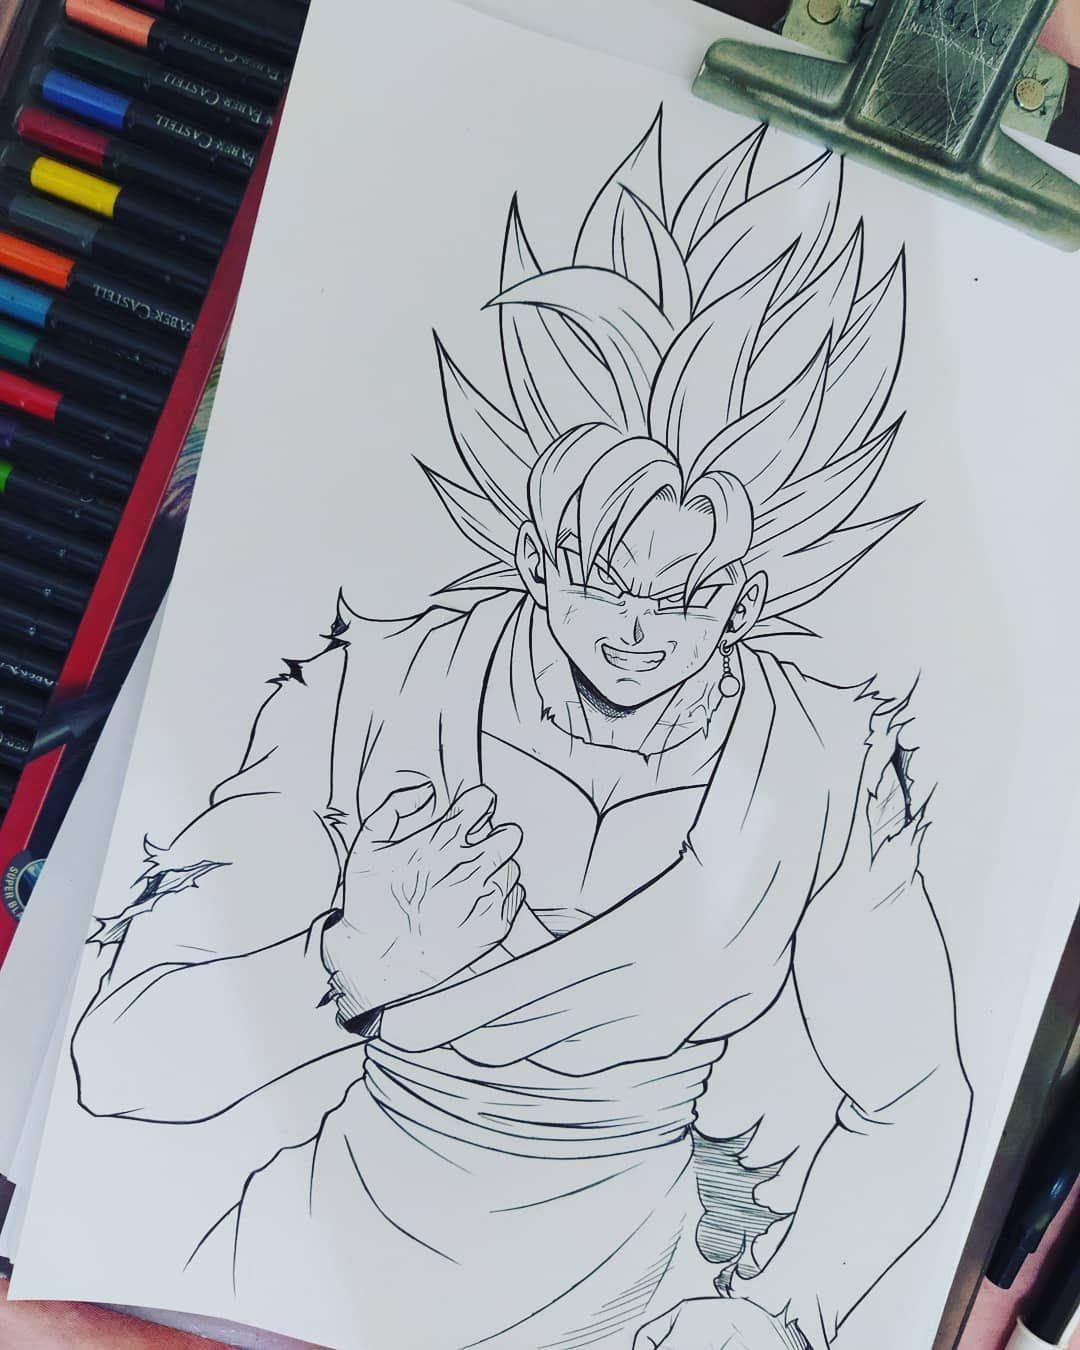 Goku Black #goku #anime #dbz #dragonball #art #animebrasil #follow #follow4like #artist #manga #animeart #animes #dragonballz #bic #fabercastell #artink #tattoo #tattooink #onixtattooink